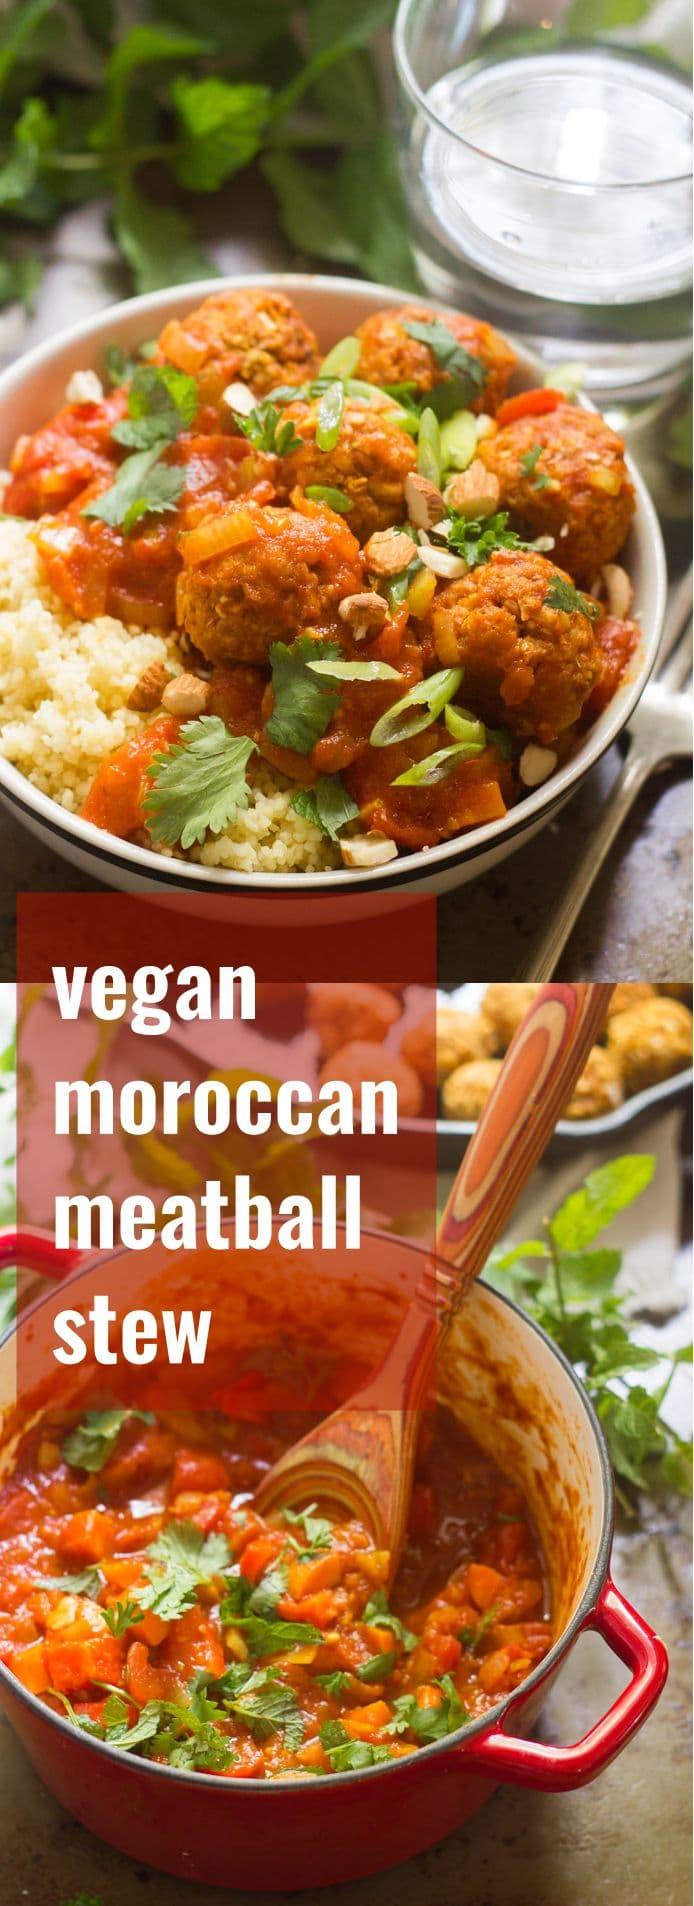 Vegan Moroccan Meatball Stew